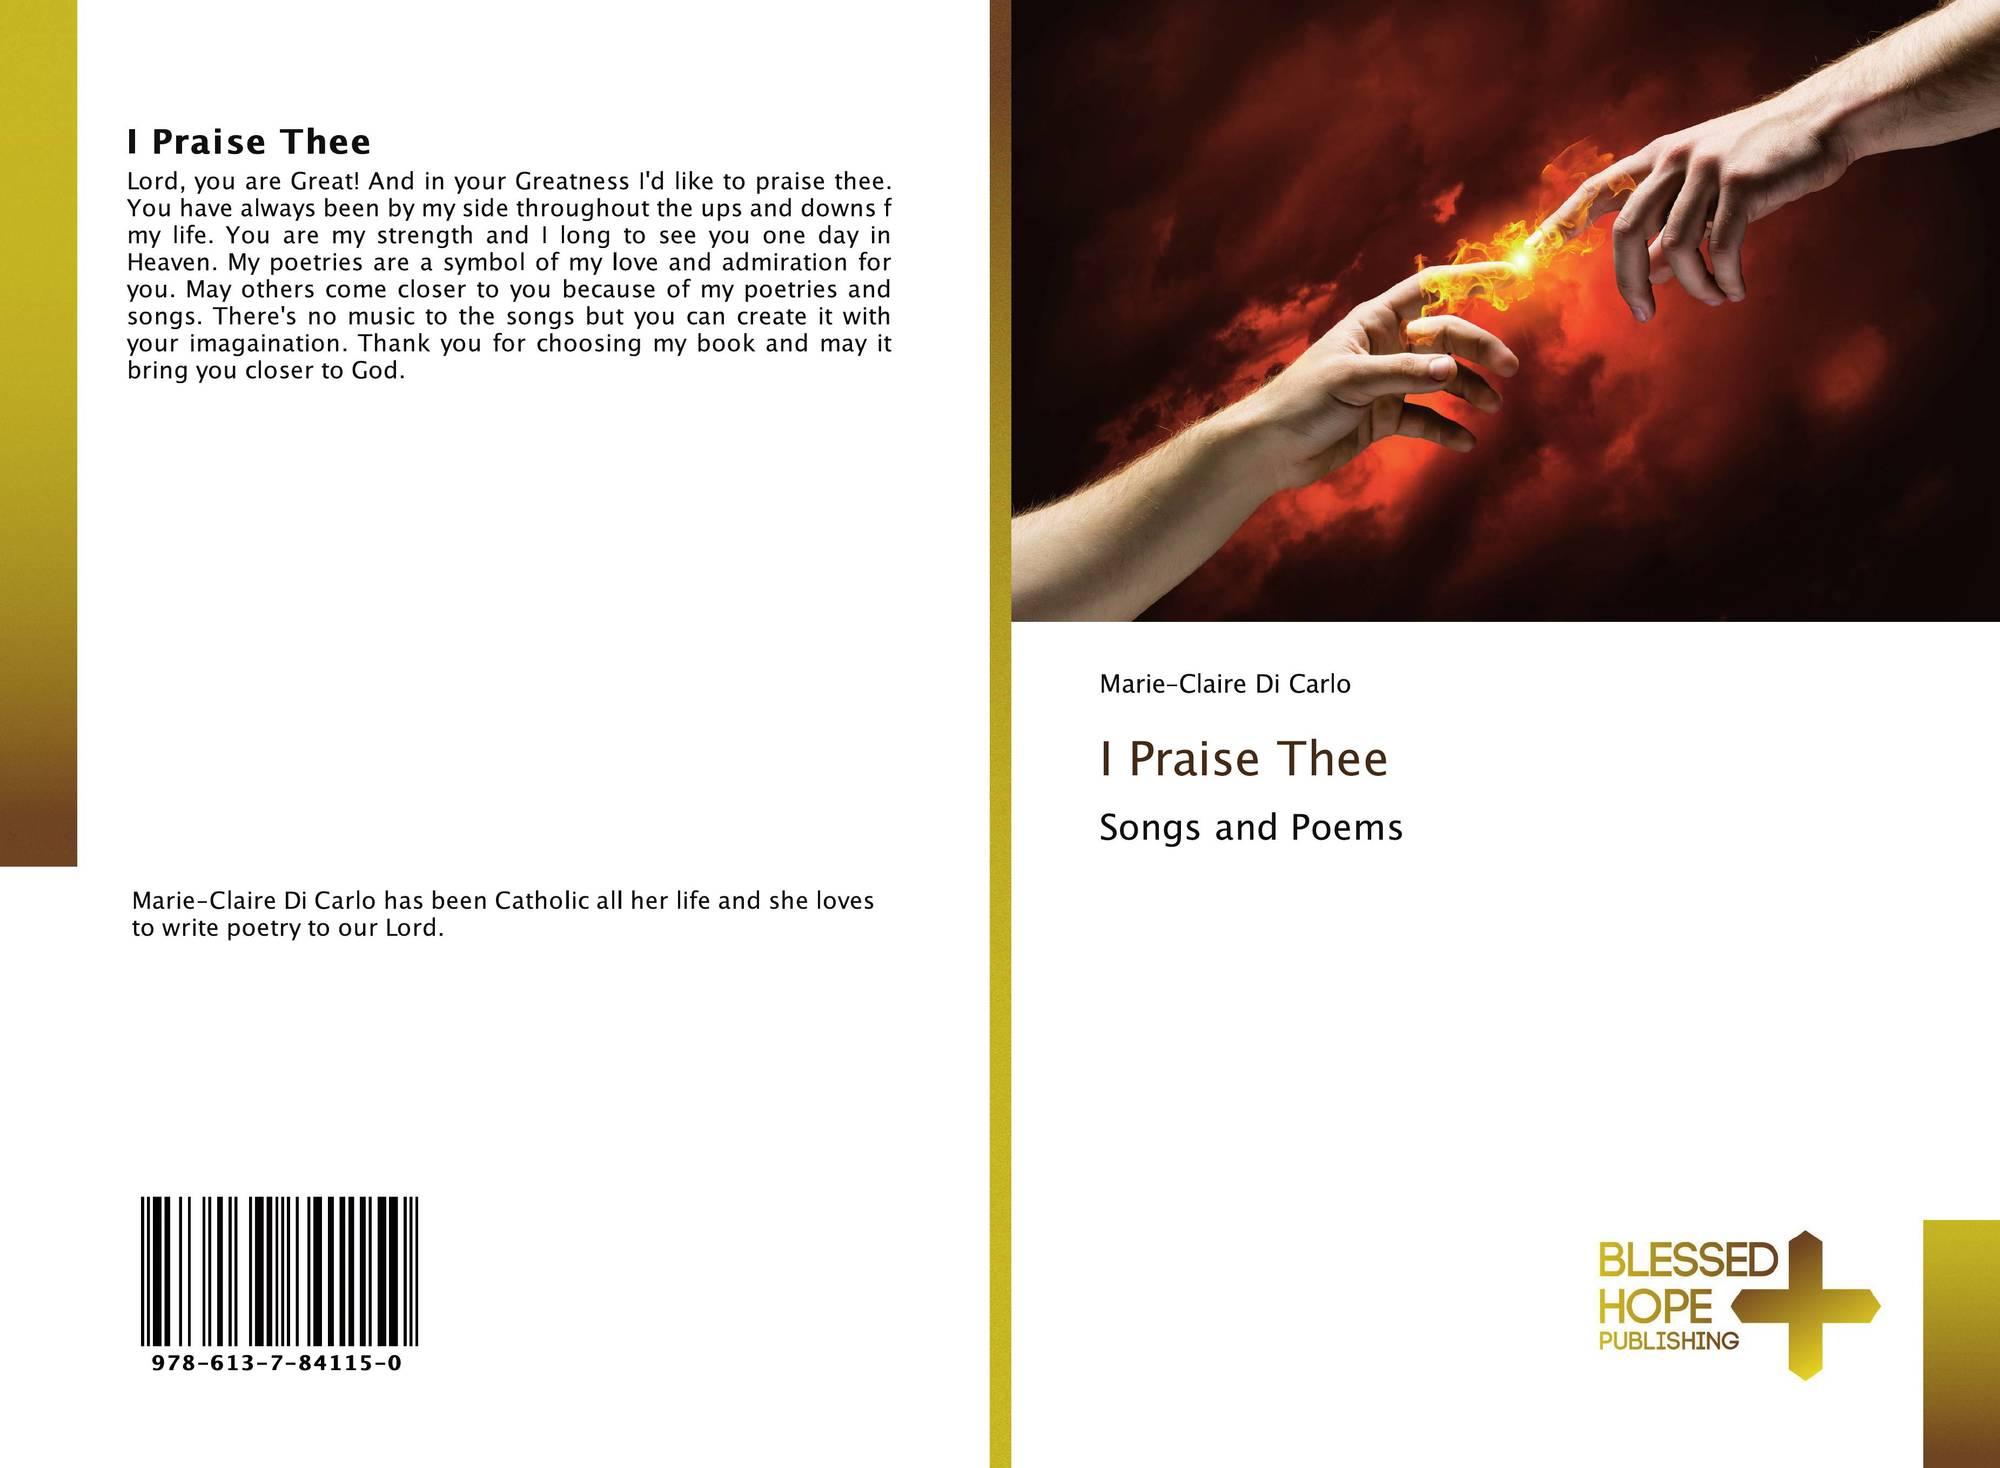 I Praise Thee, 978-613-7-84115-0, 6137841154 ,9786137841150